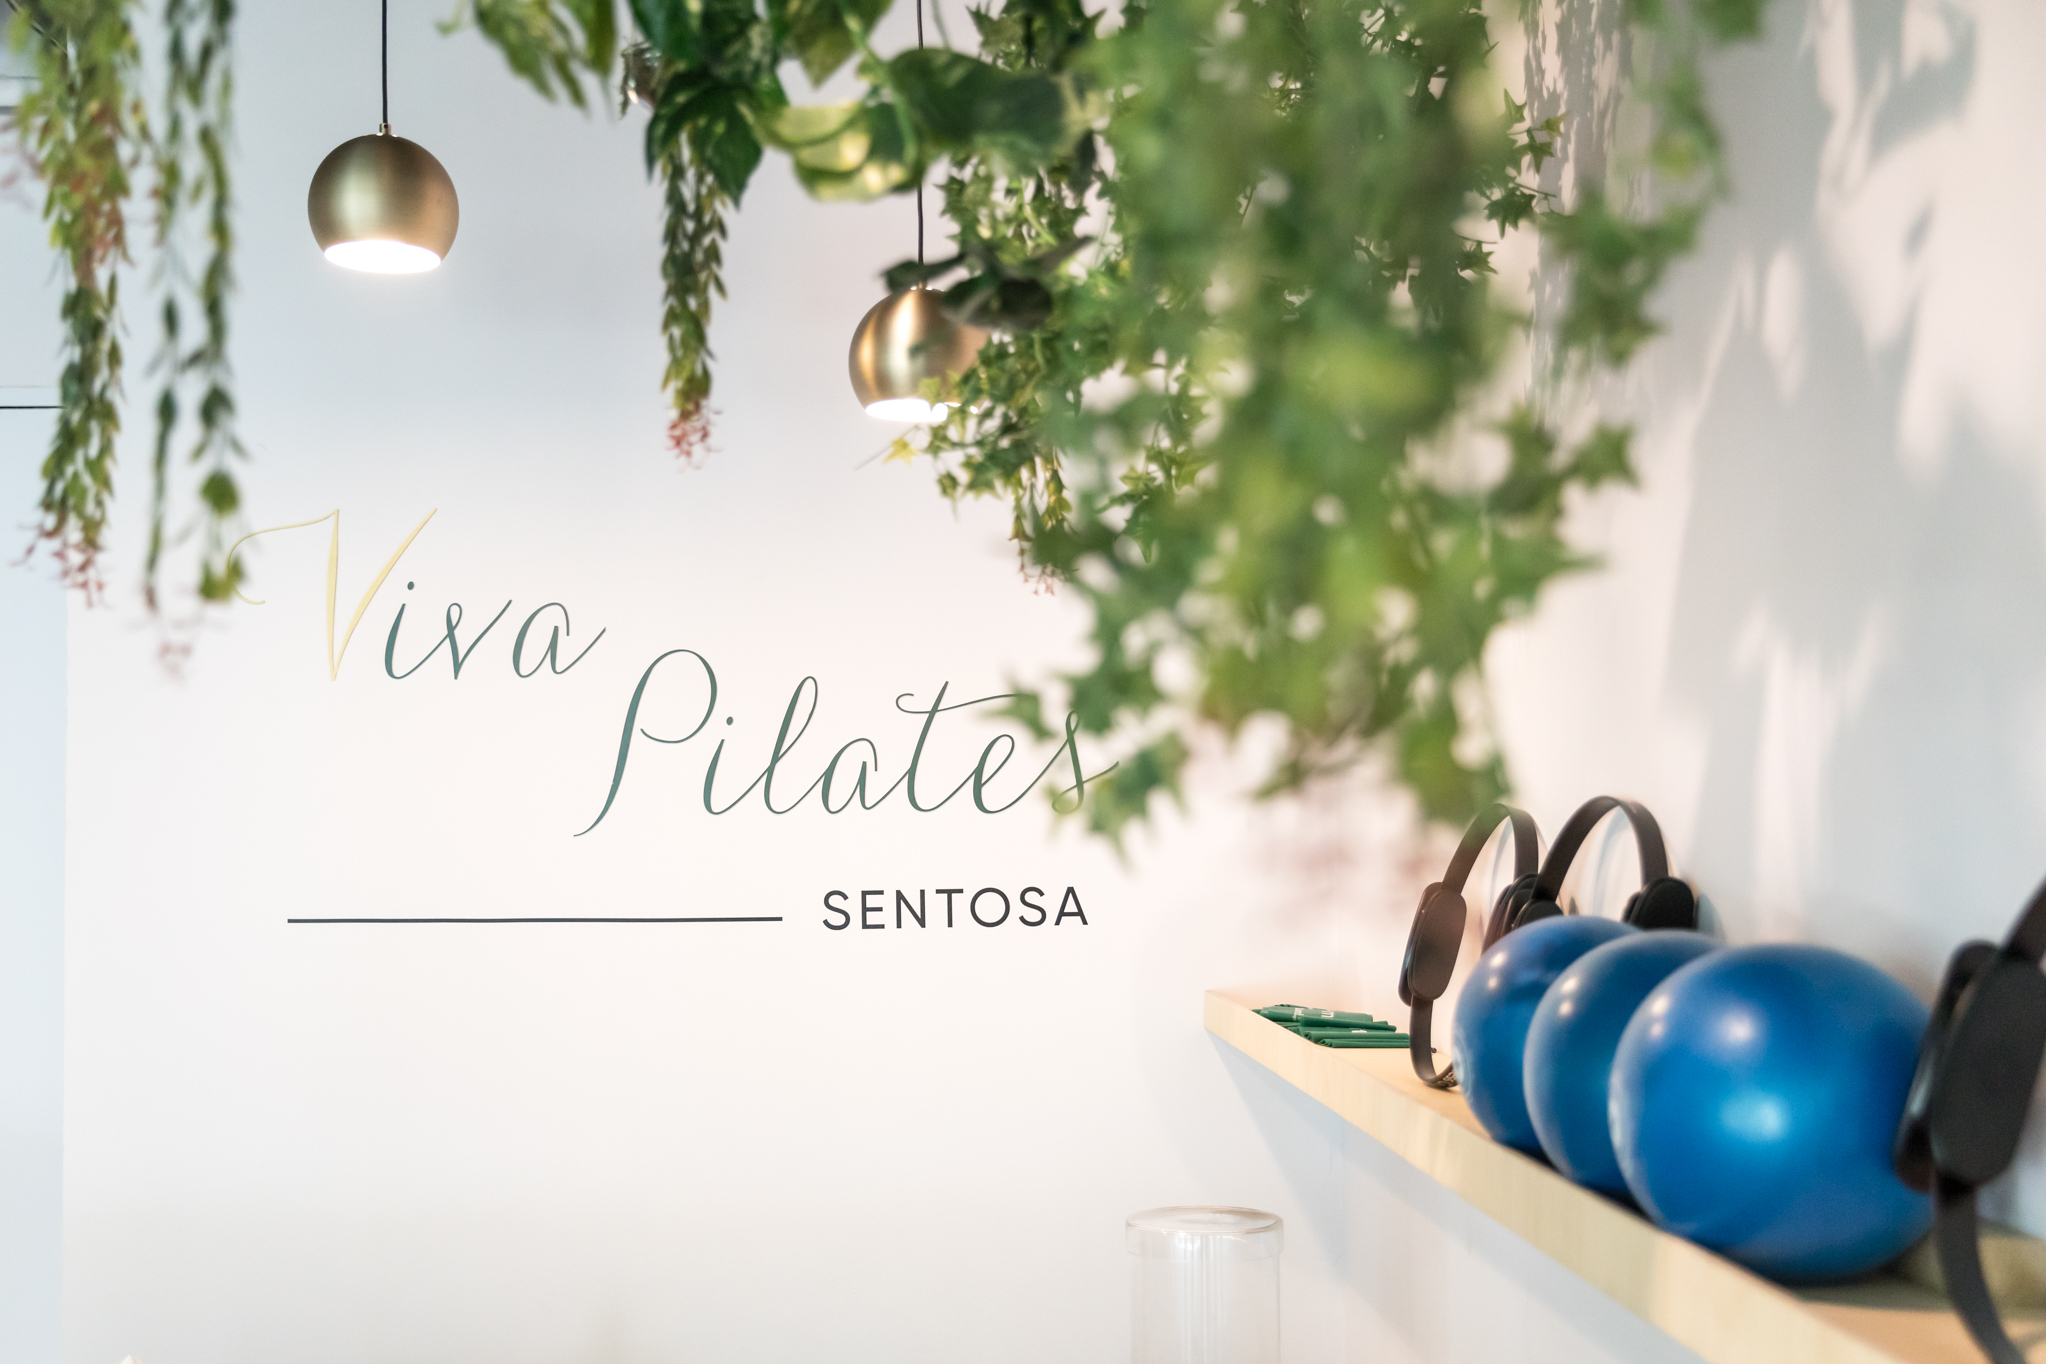 viva-pilates-sentosa-reformer